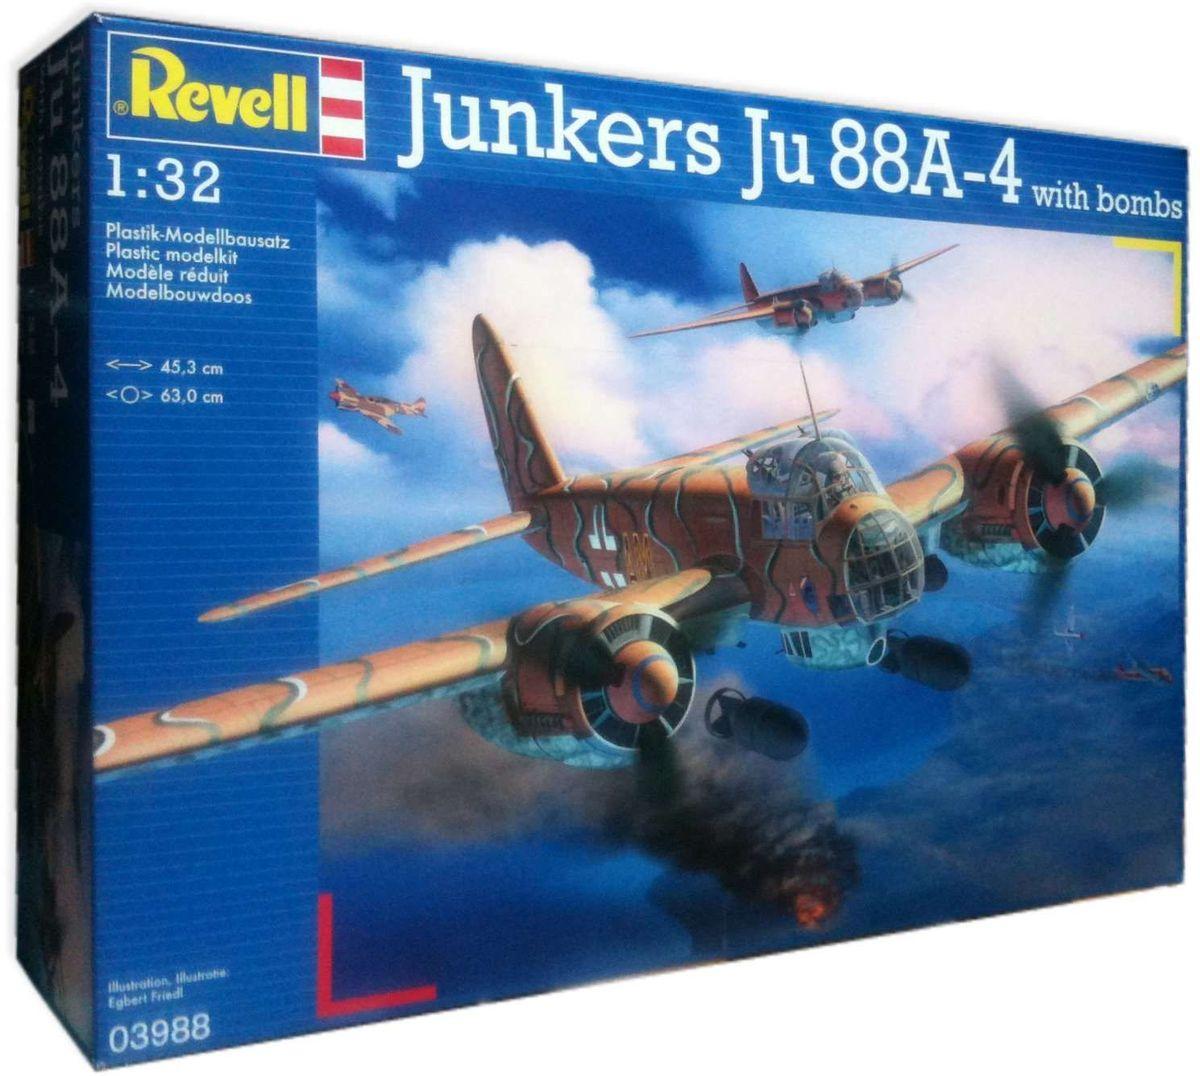 Revell Сборная модель Бомбардировщик Junkers Ju 88A-4 с бомбами